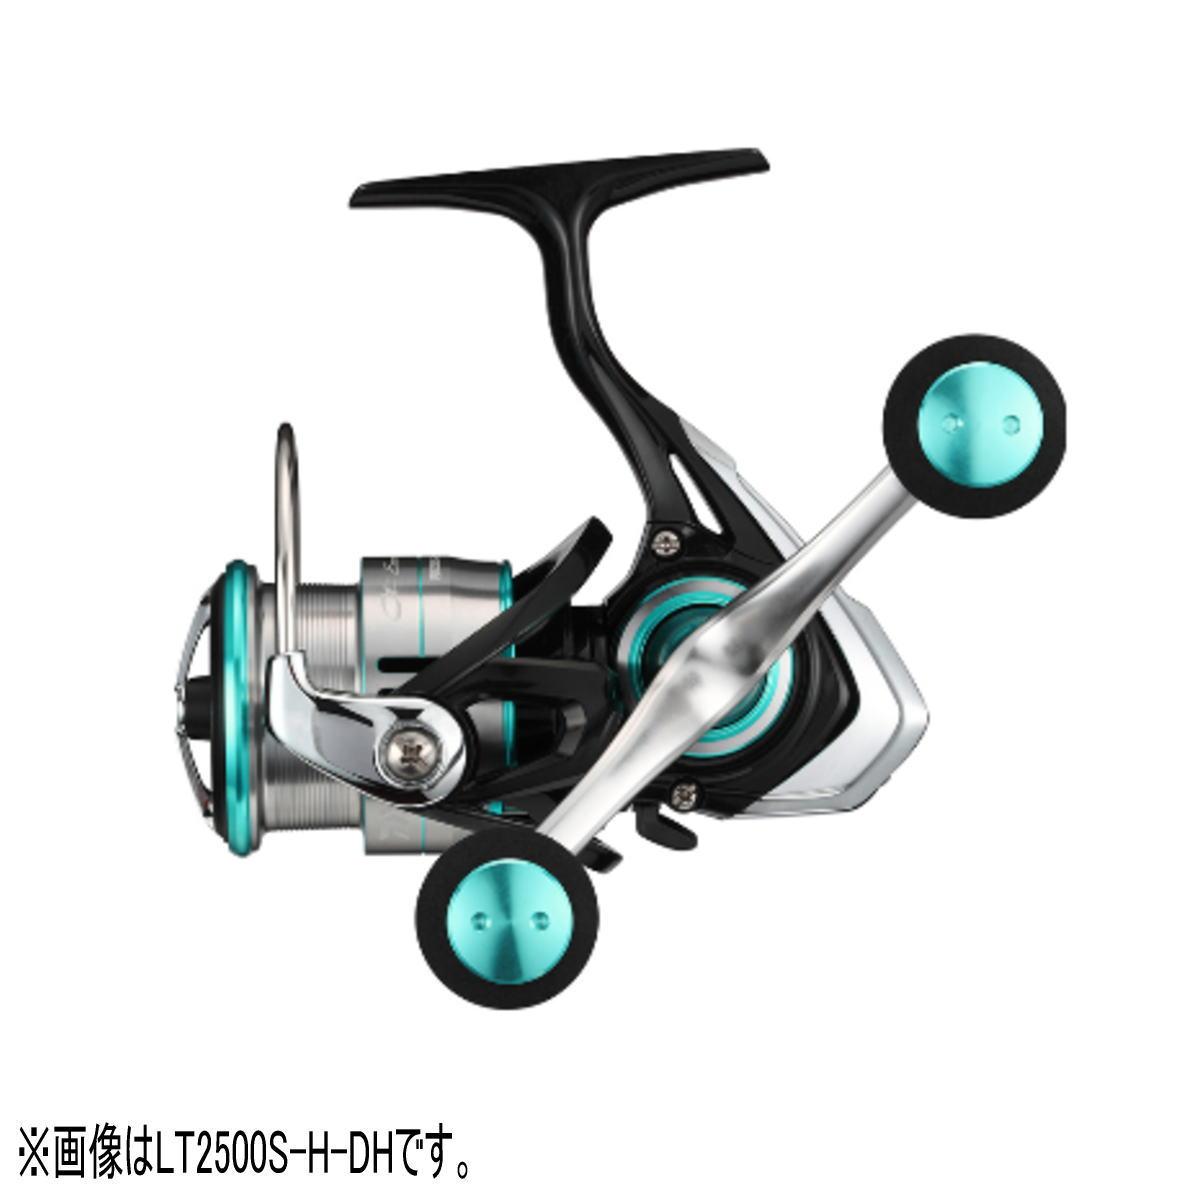 Daiwa reels P154 19 LT 2500S-H-DH225()0:0023:59